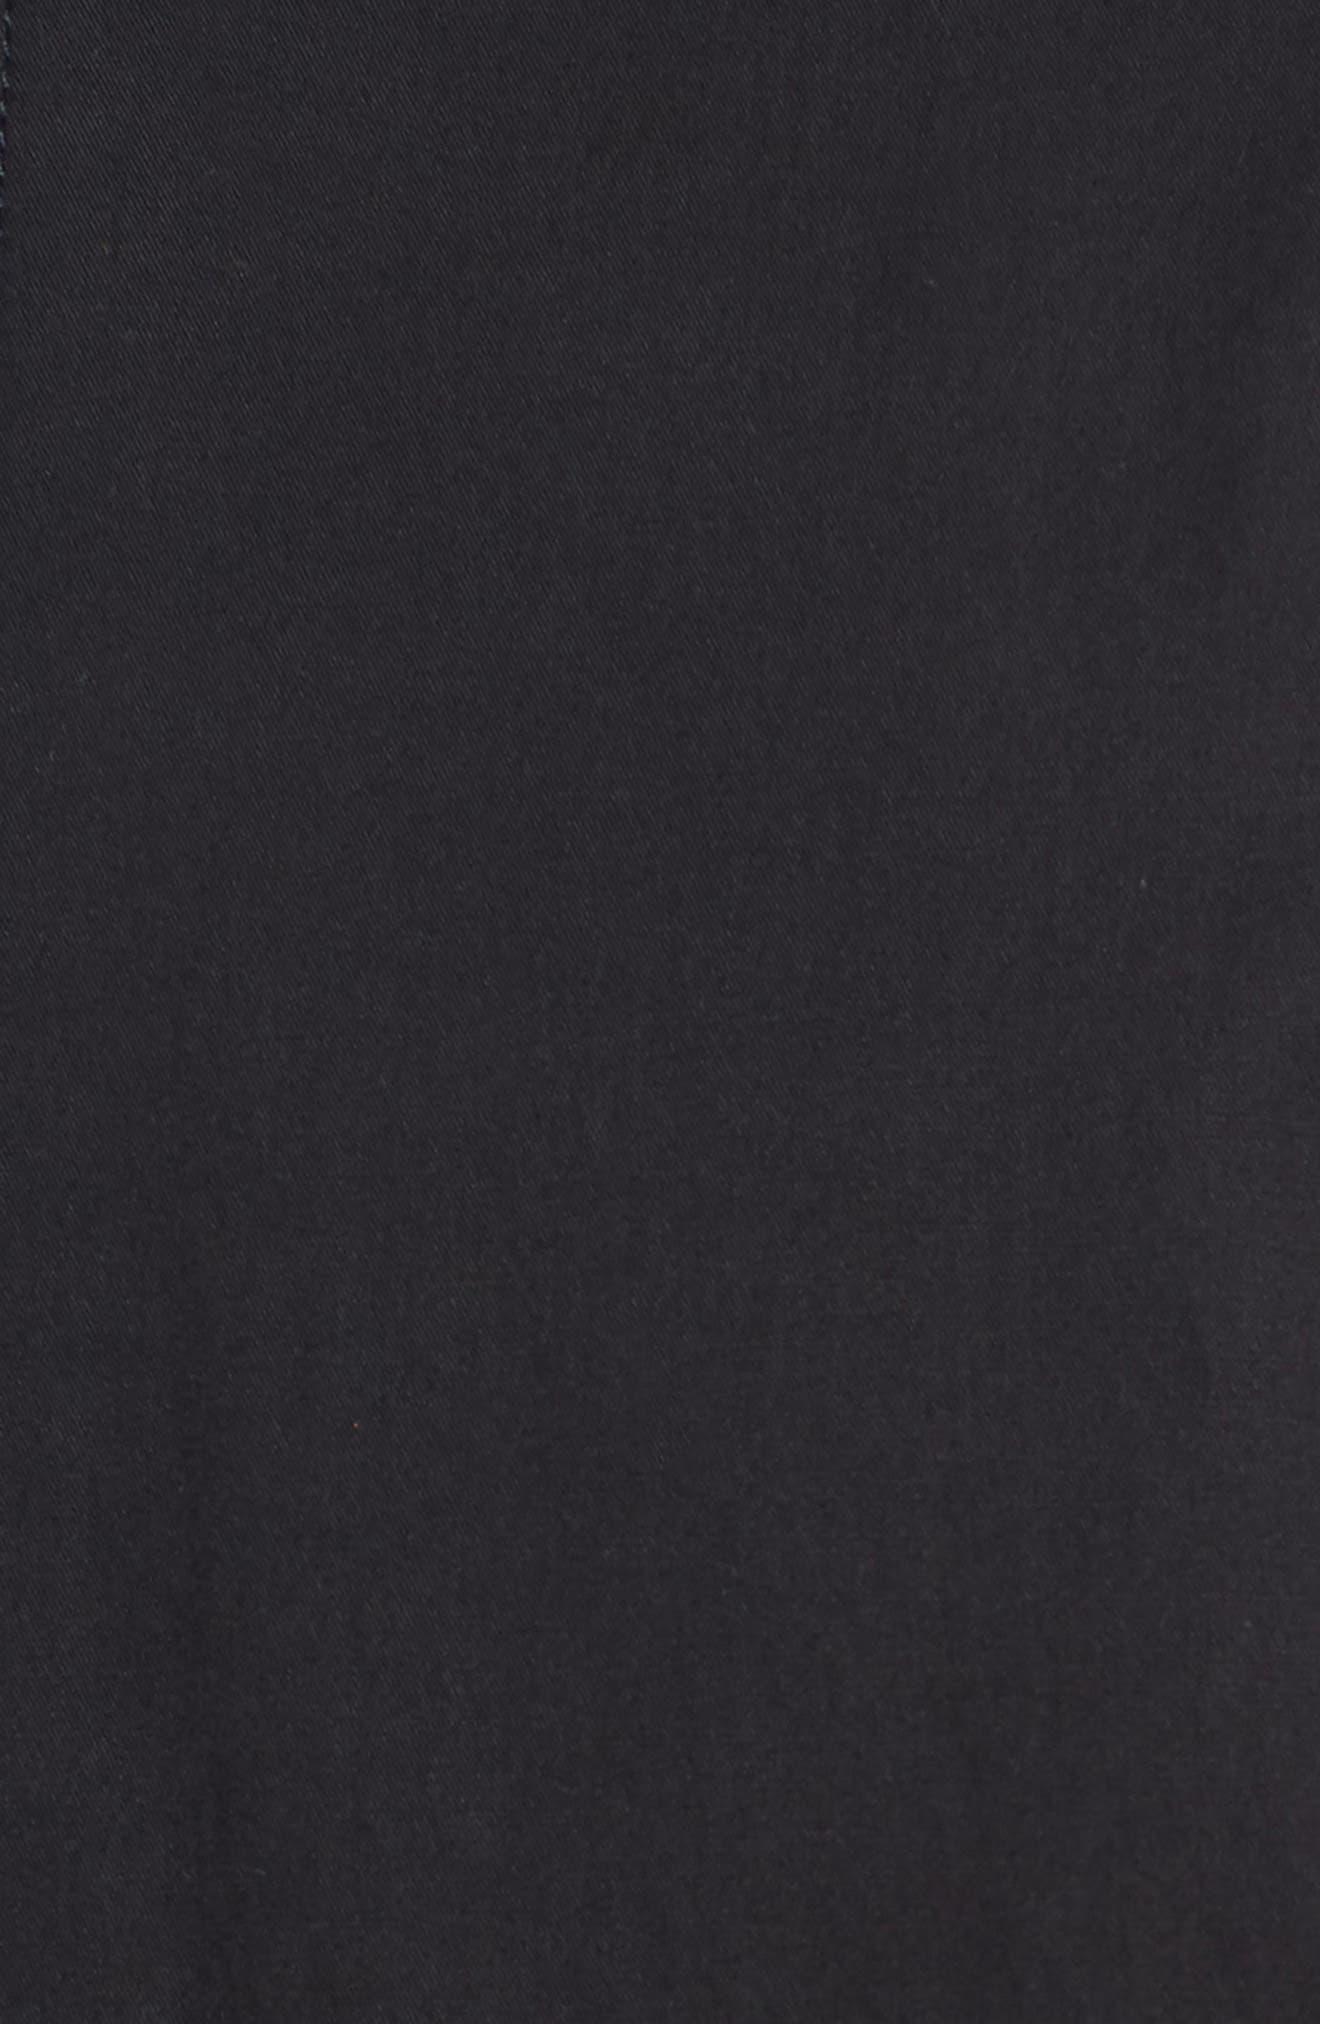 Regular Fit Bomber Jacket,                             Alternate thumbnail 6, color,                             BLACK